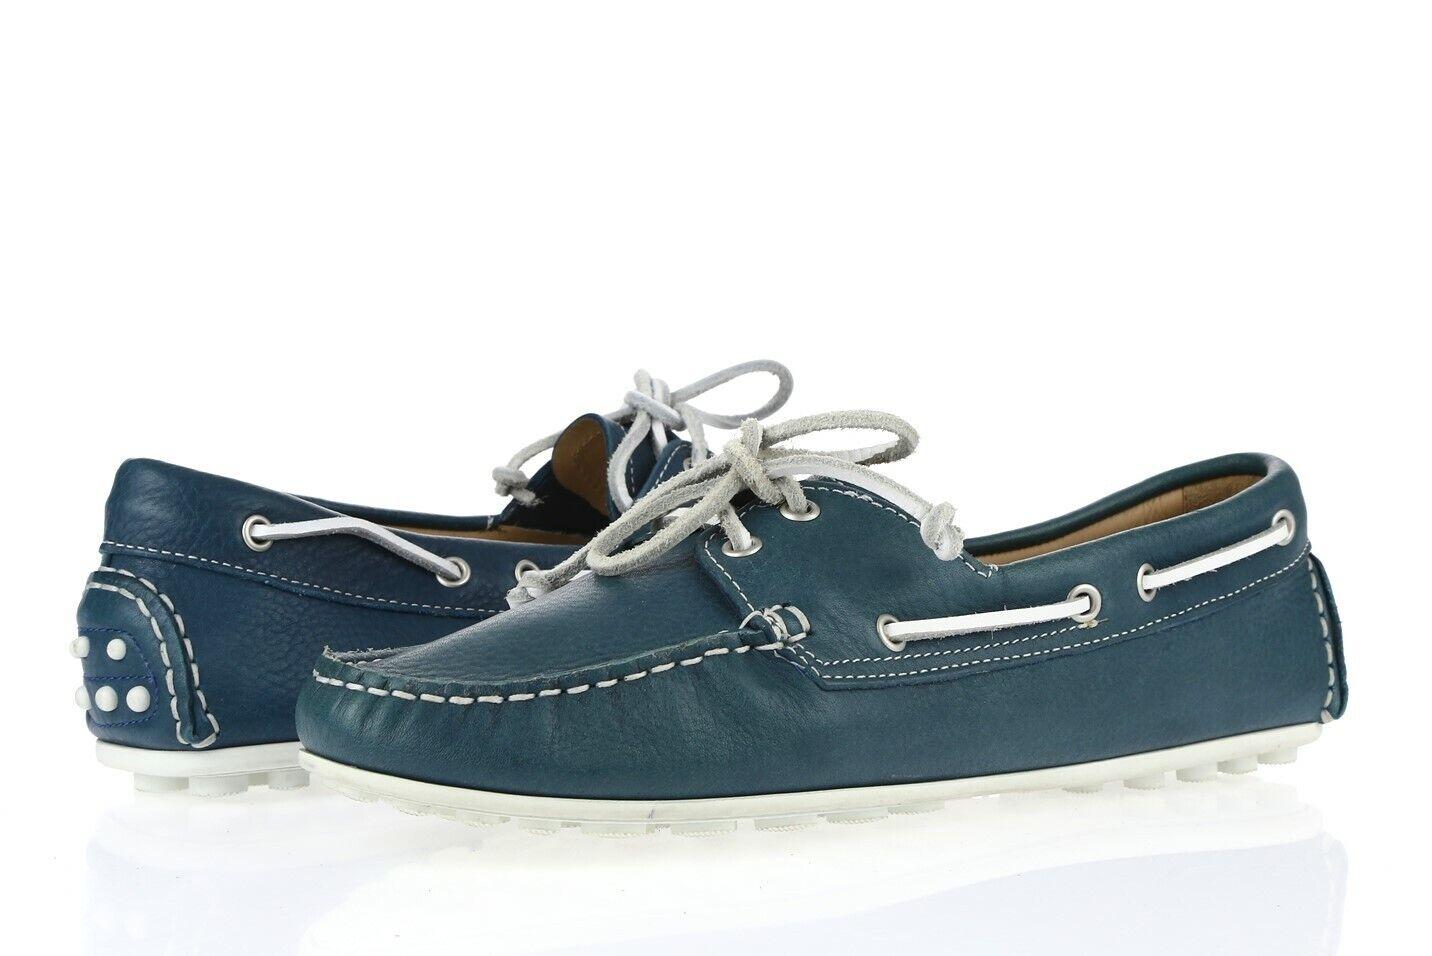 donna ECCO  CUNO LADIES 227862 Denim blu Leather Boat scarpe Sz.38  best-seller